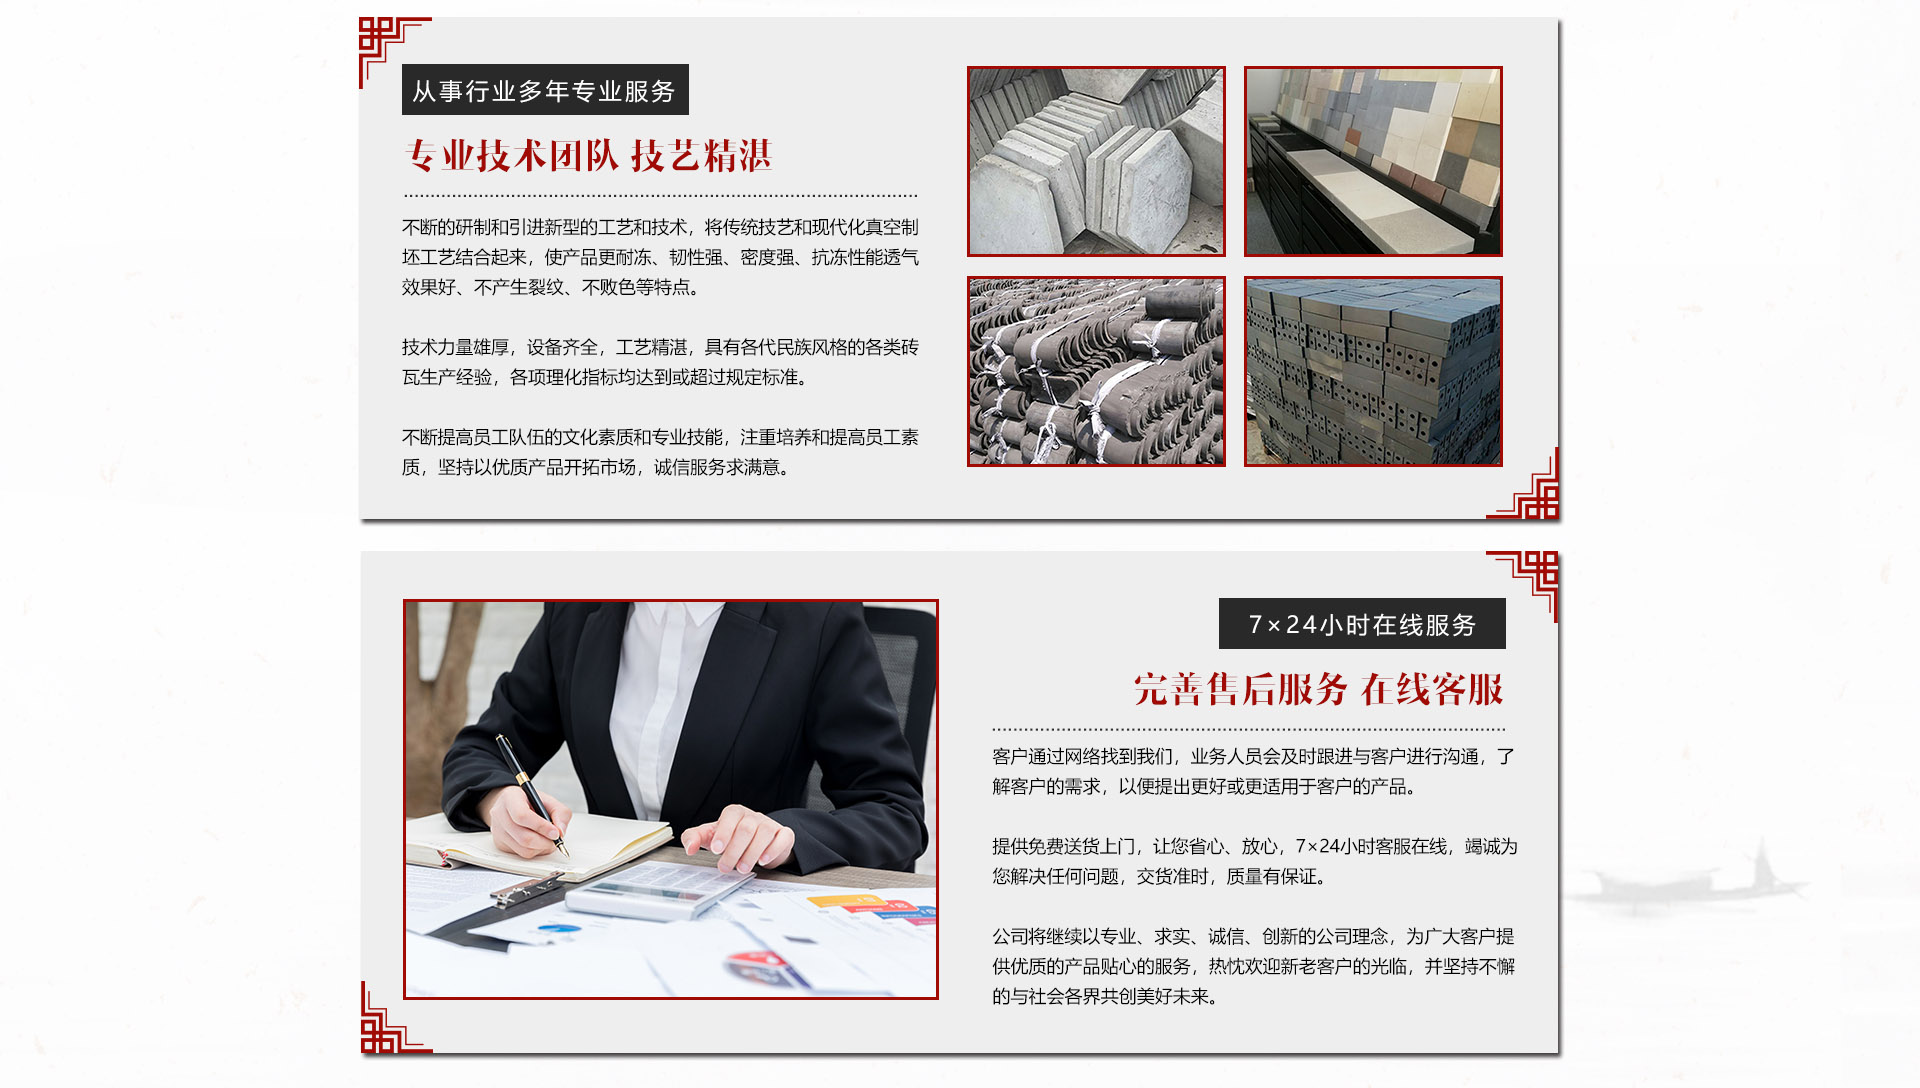 raybet雷竞技陶土雷竞技APP下载服务专业